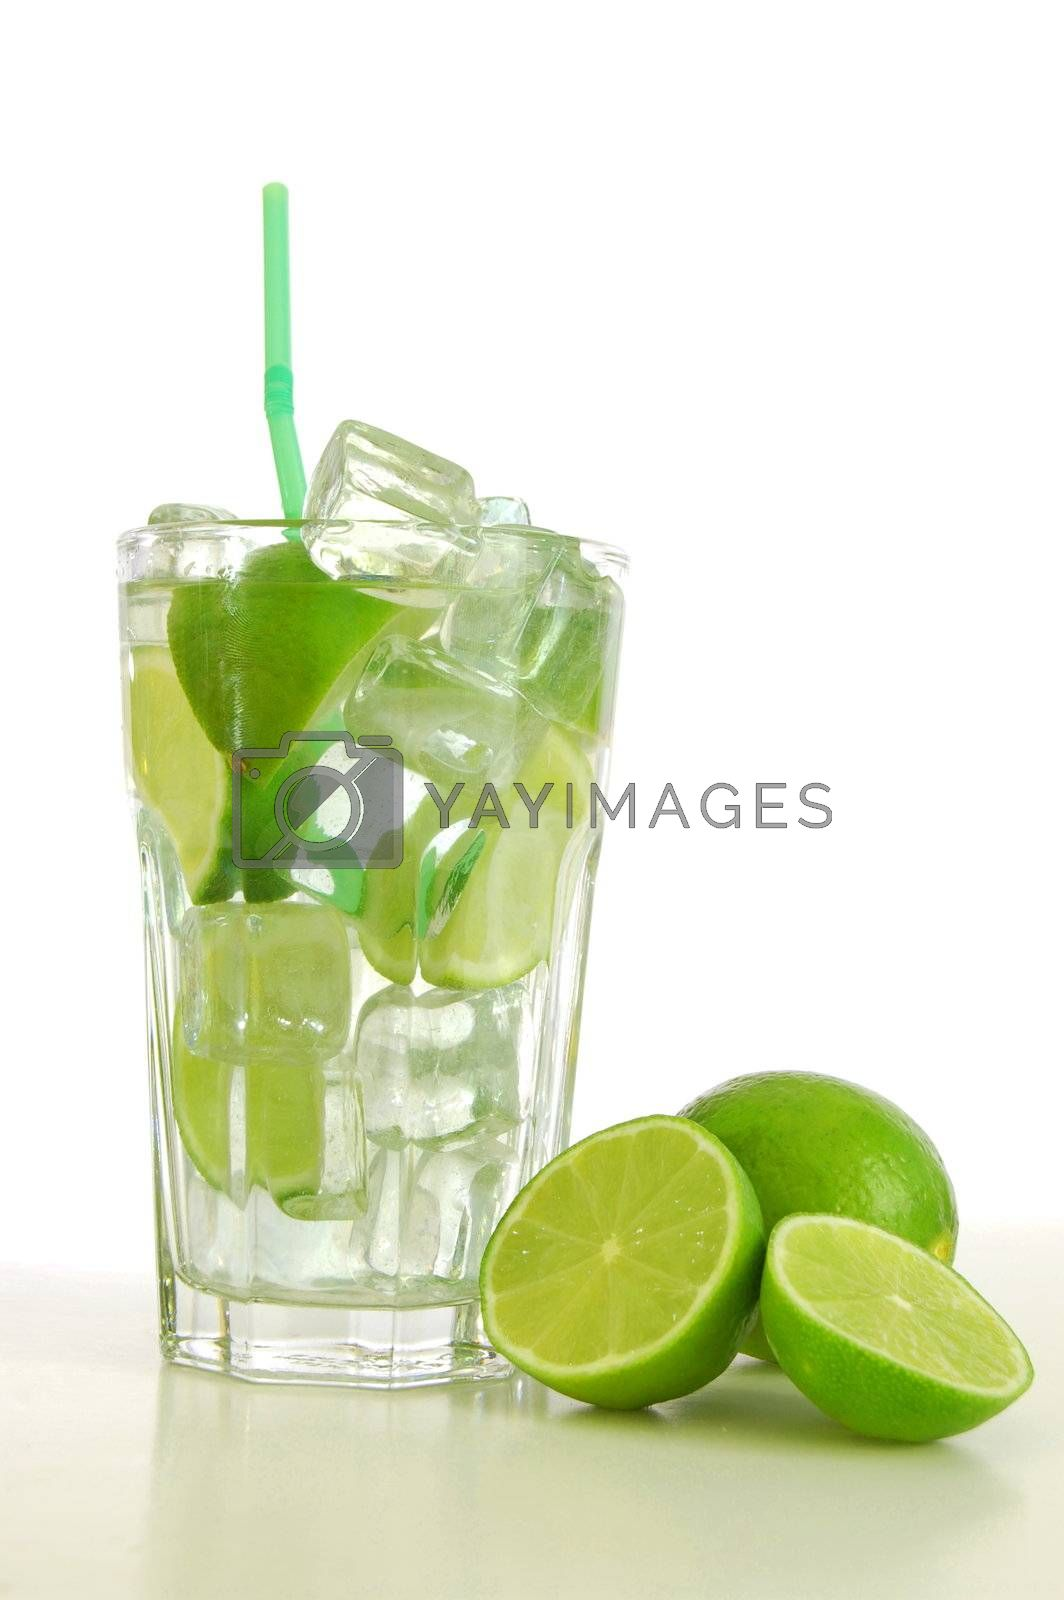 Caipirinha cocktail with green lemon and ice cubes